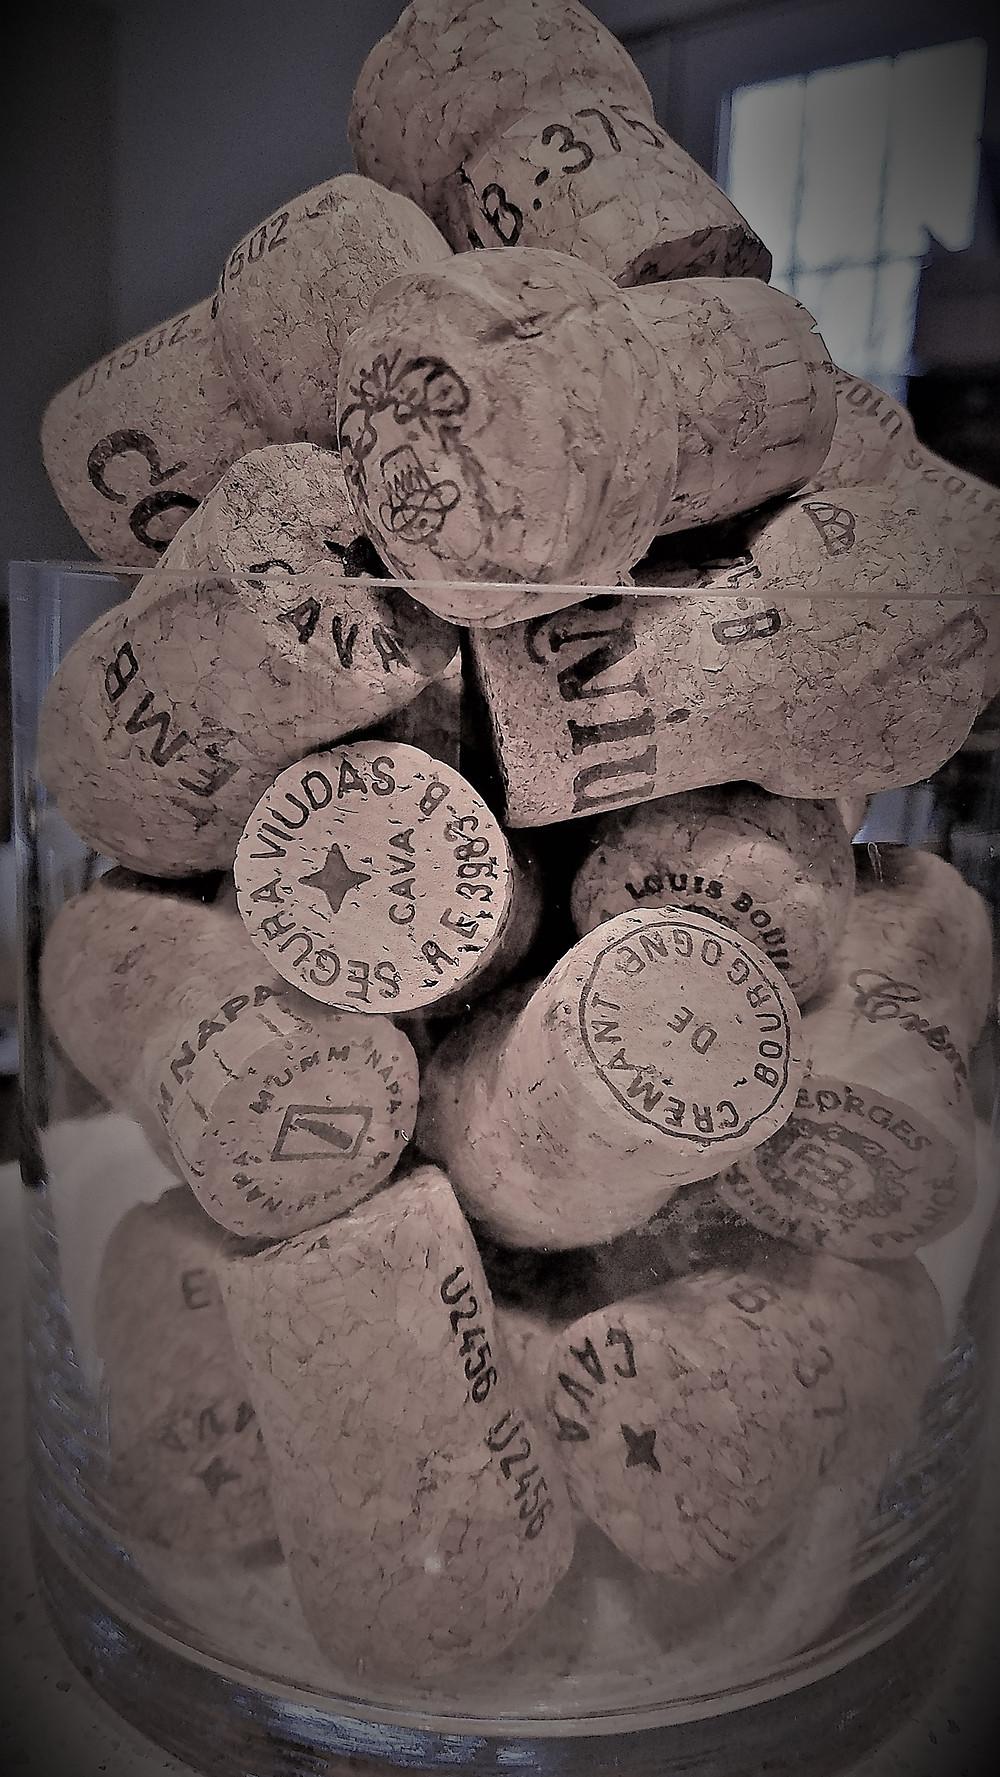 Traveleidoscope:  Champagne corks